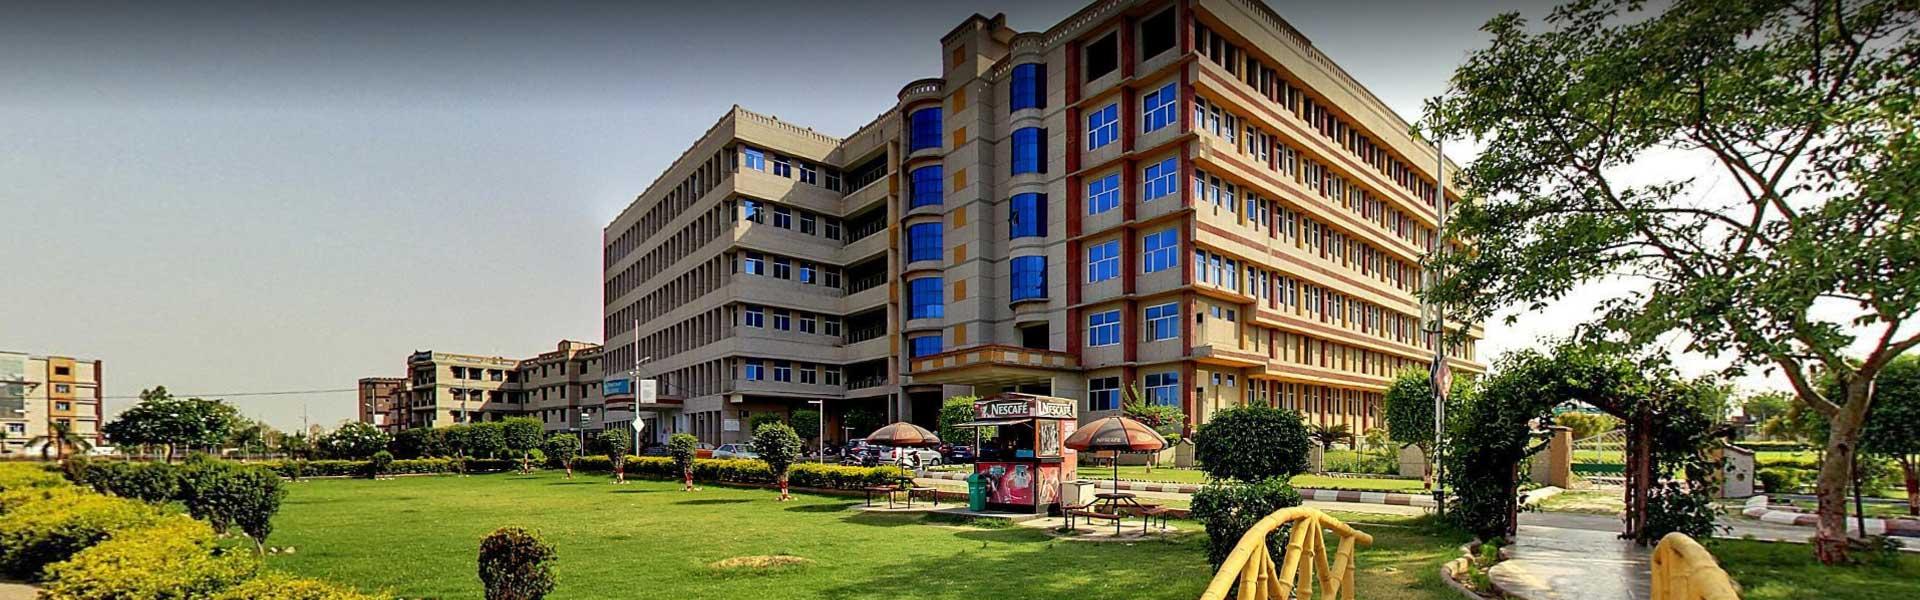 Maharana Pratap Dental College and Hospital, Kanpur Image